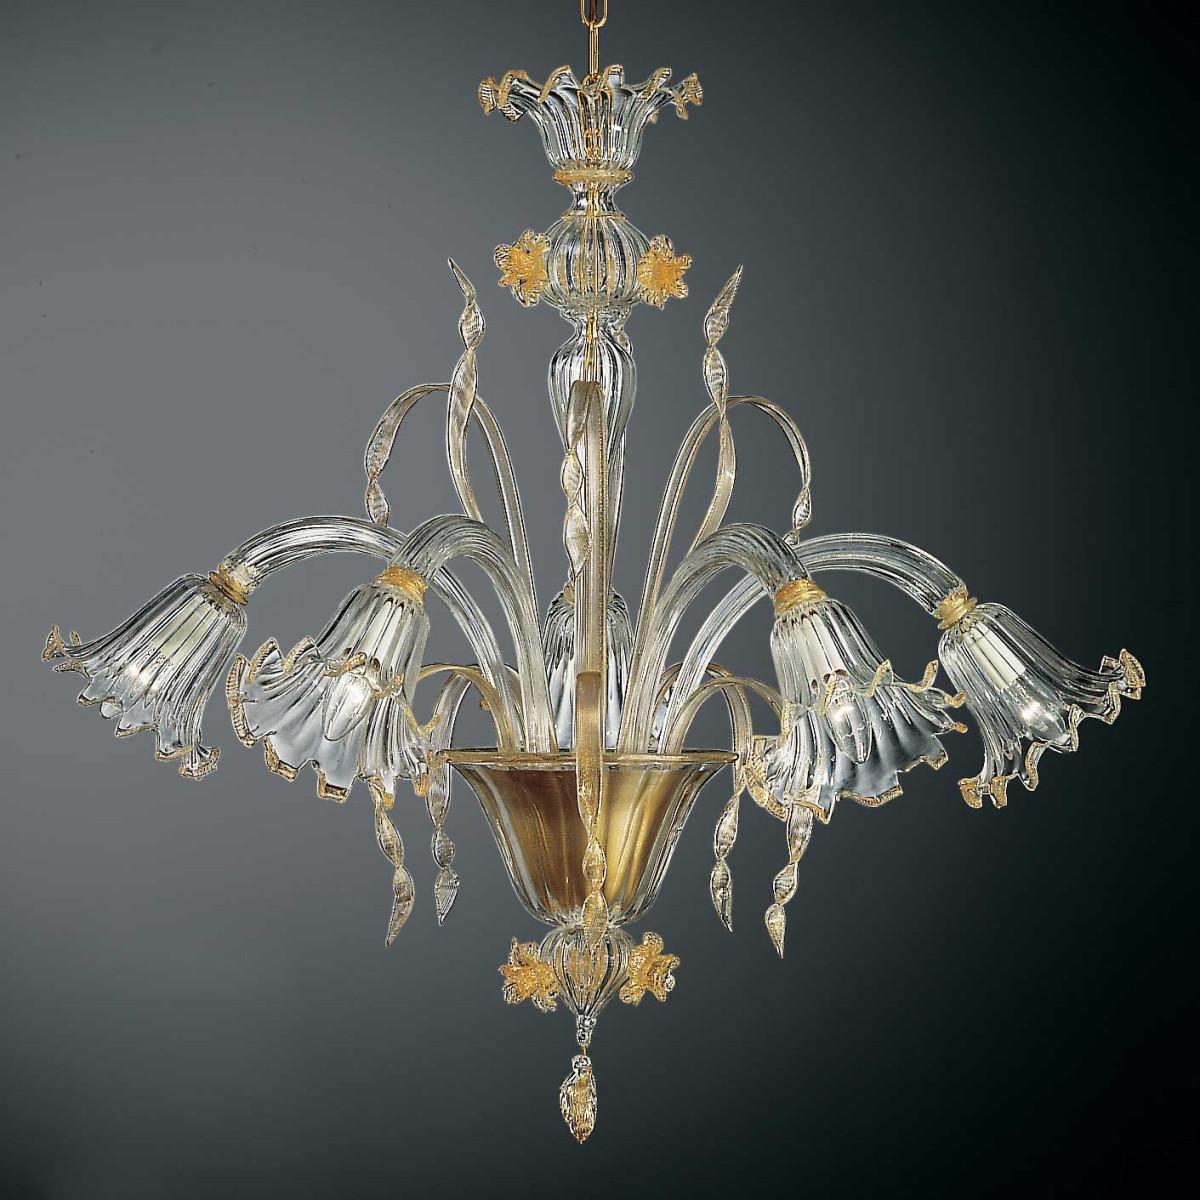 Mori 5 lumieres lustre Murano - couleur transparent or